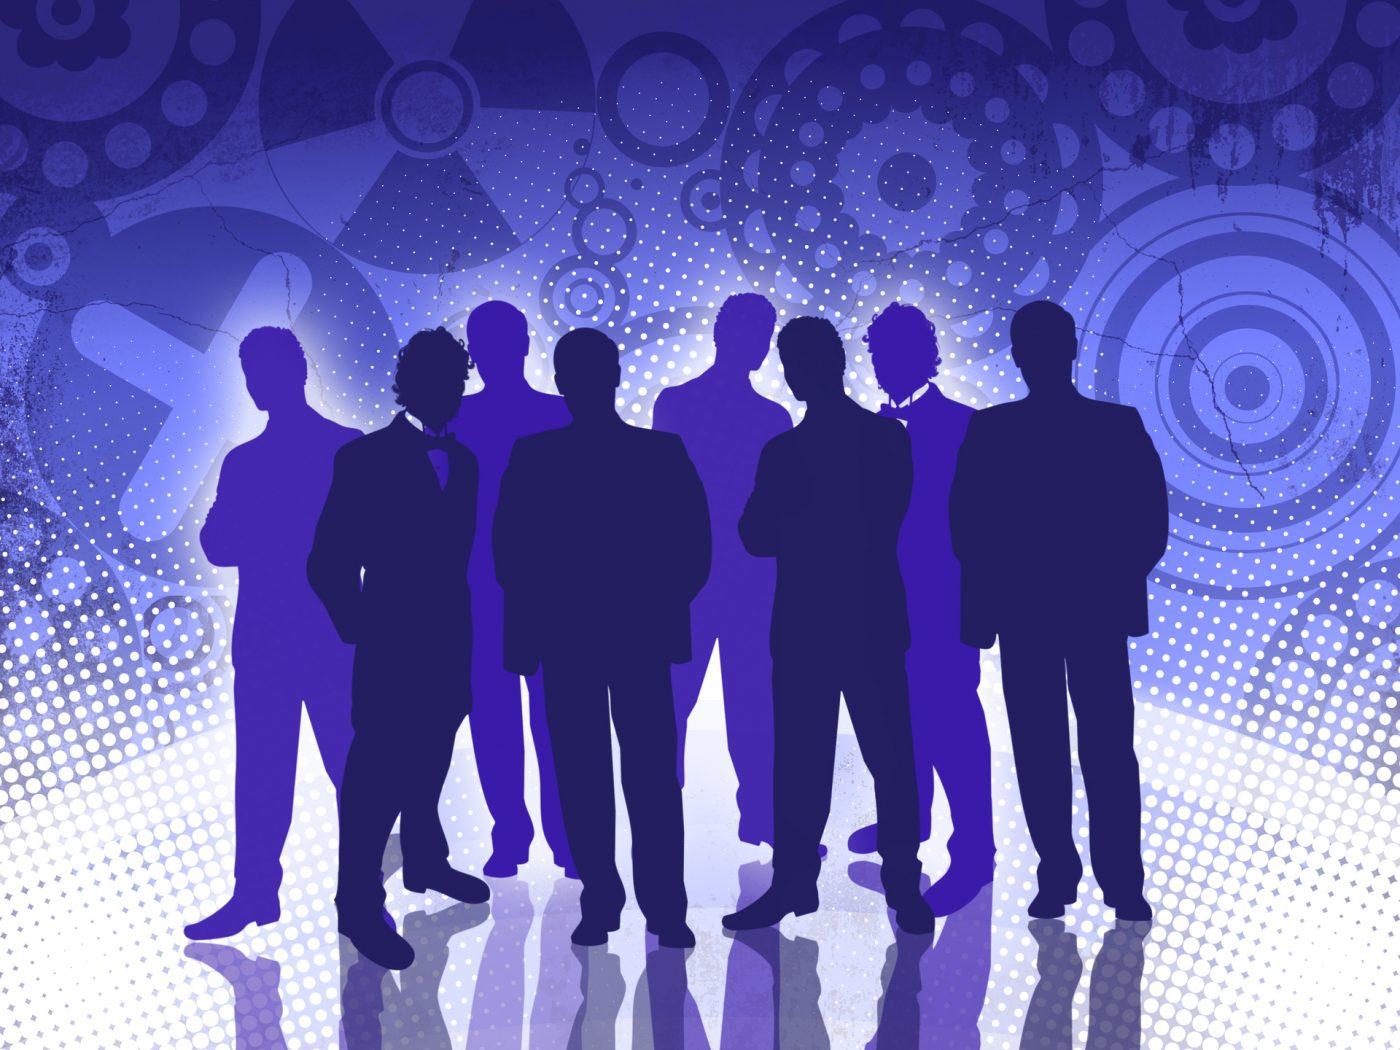 meeting- people-1236603-1920x1440, by Gabriella Fabbri